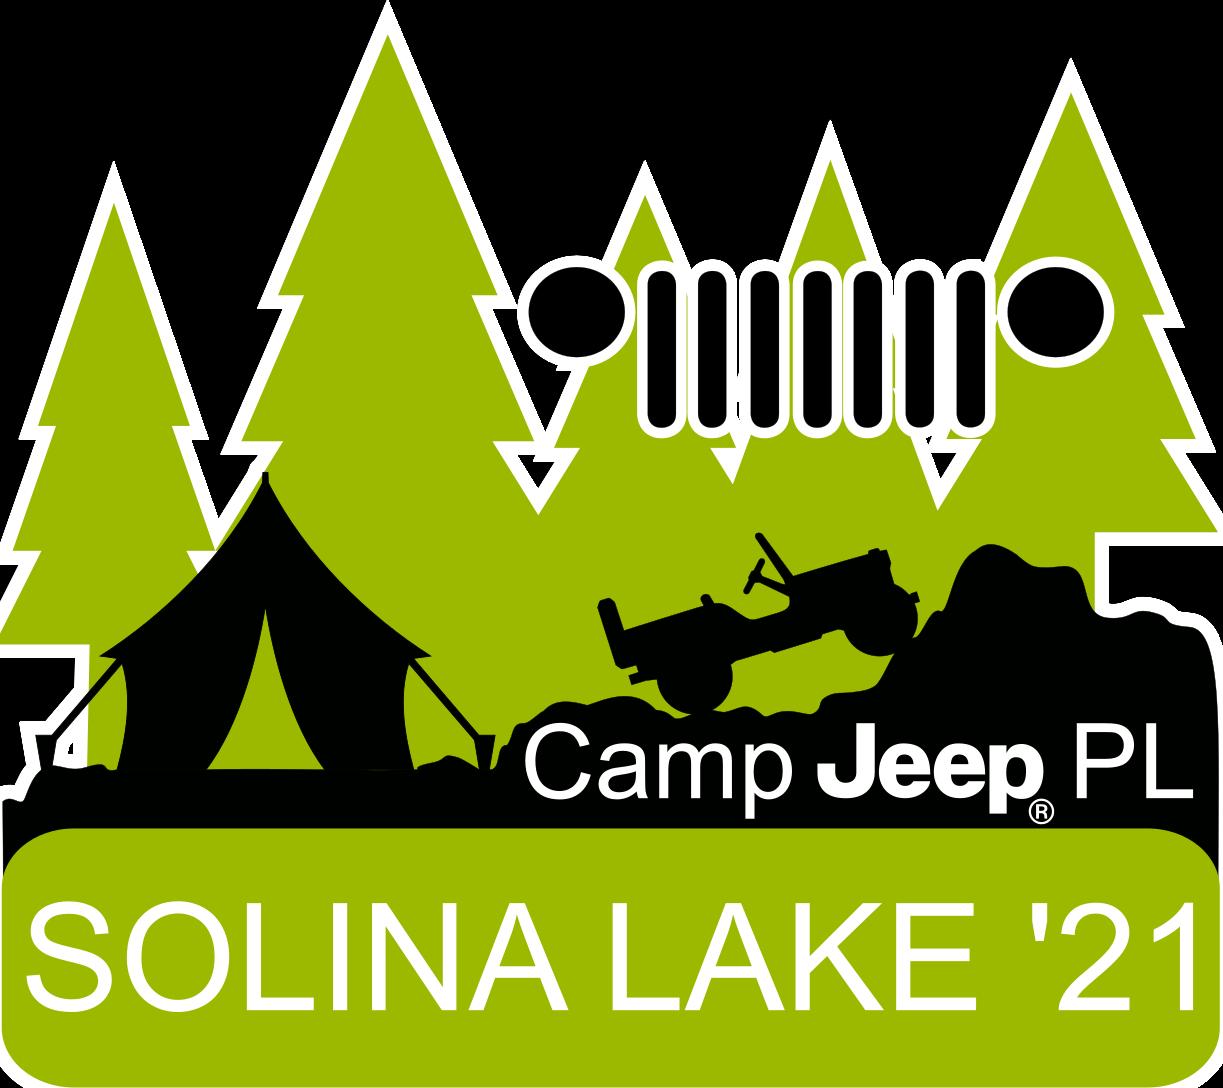 Camp Jeep PL